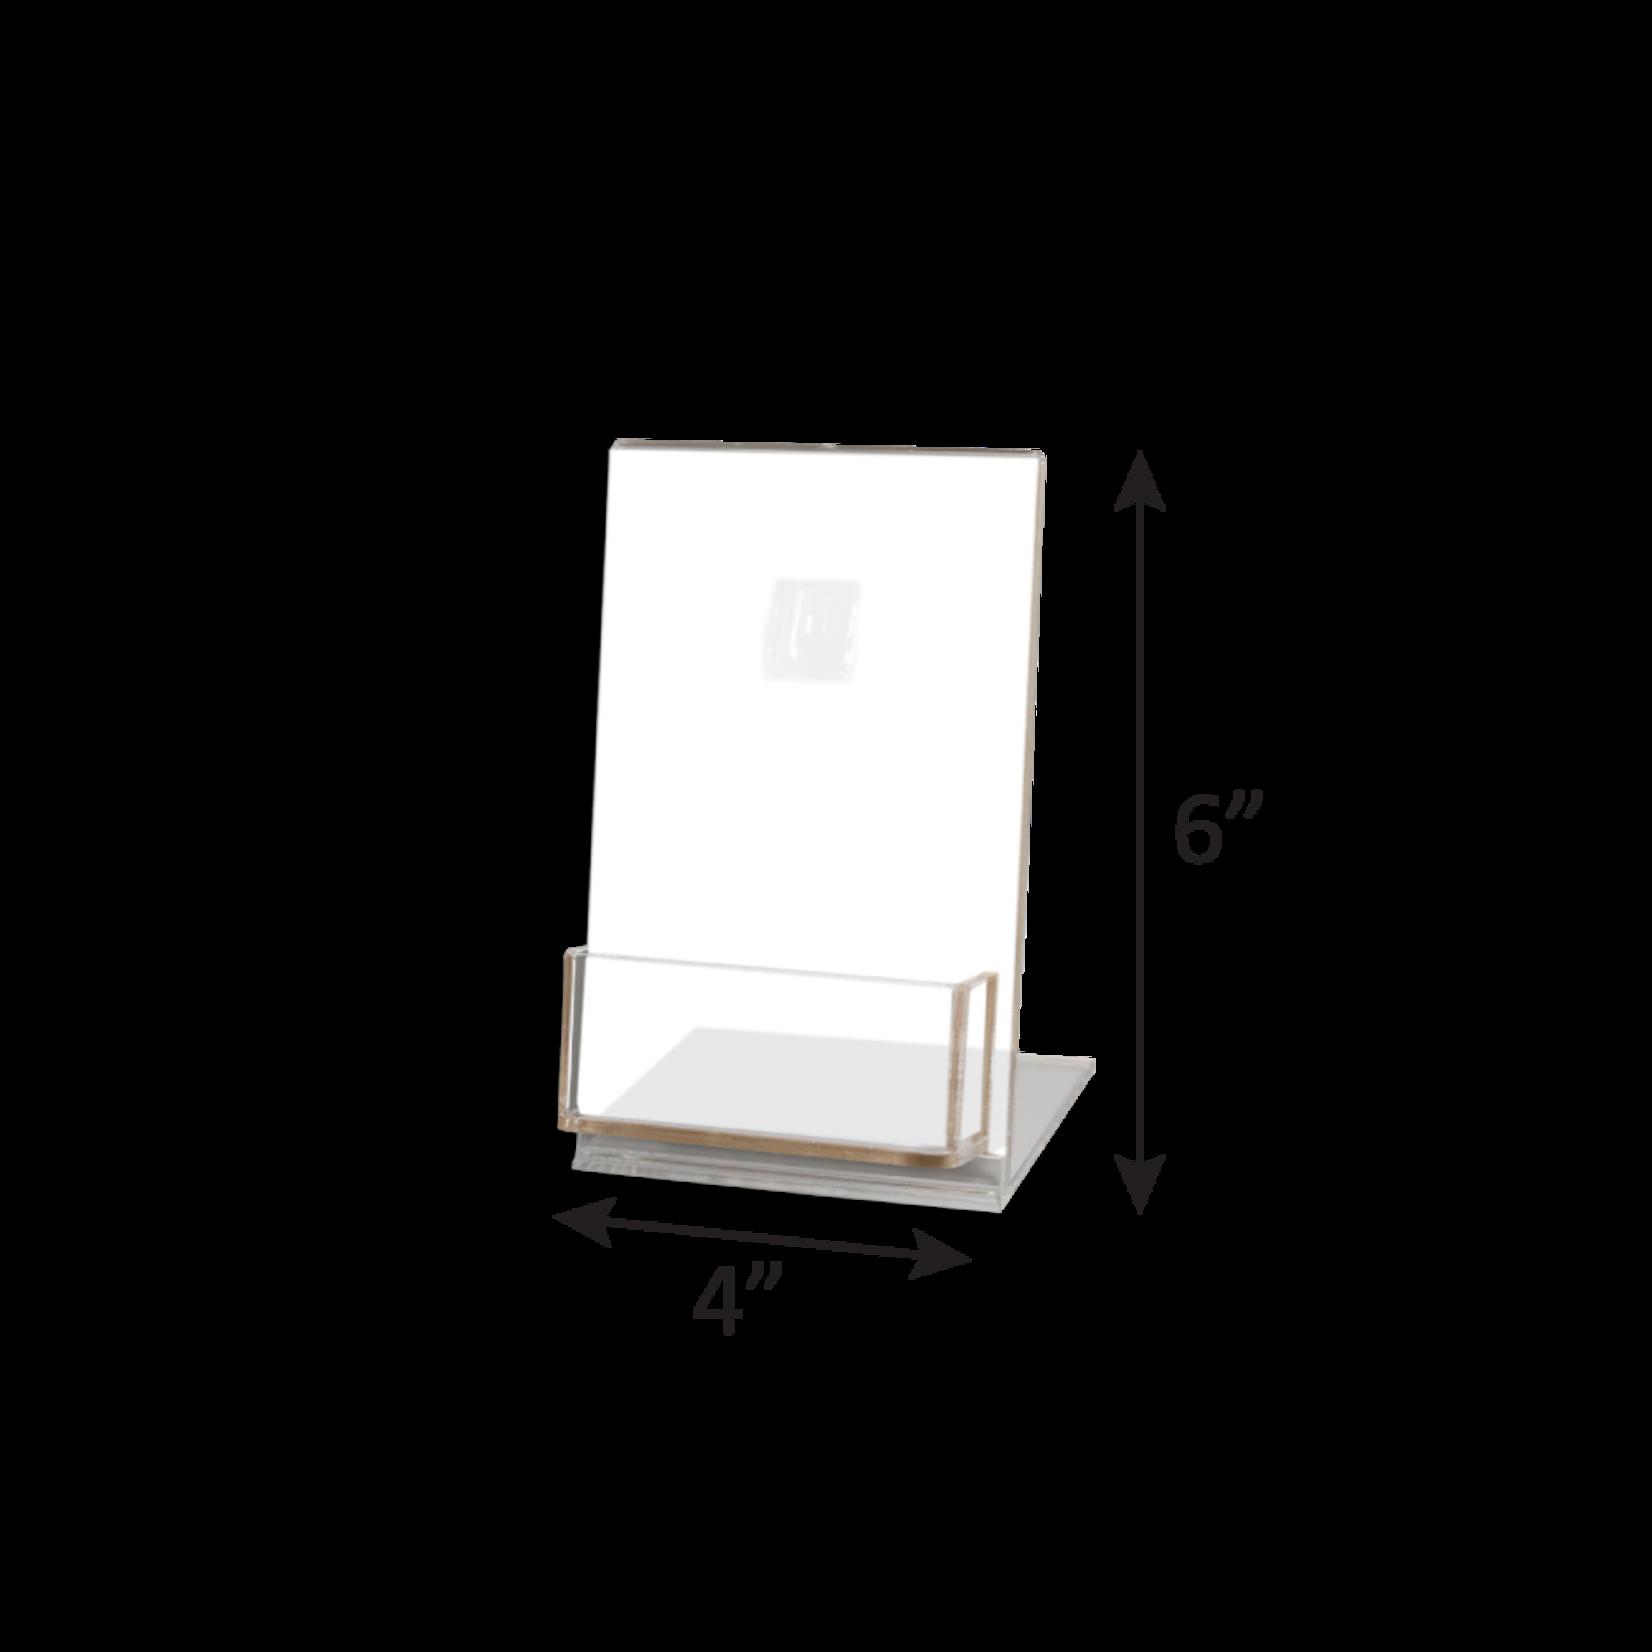 4x6 Acrylic Gift Card Display Stand